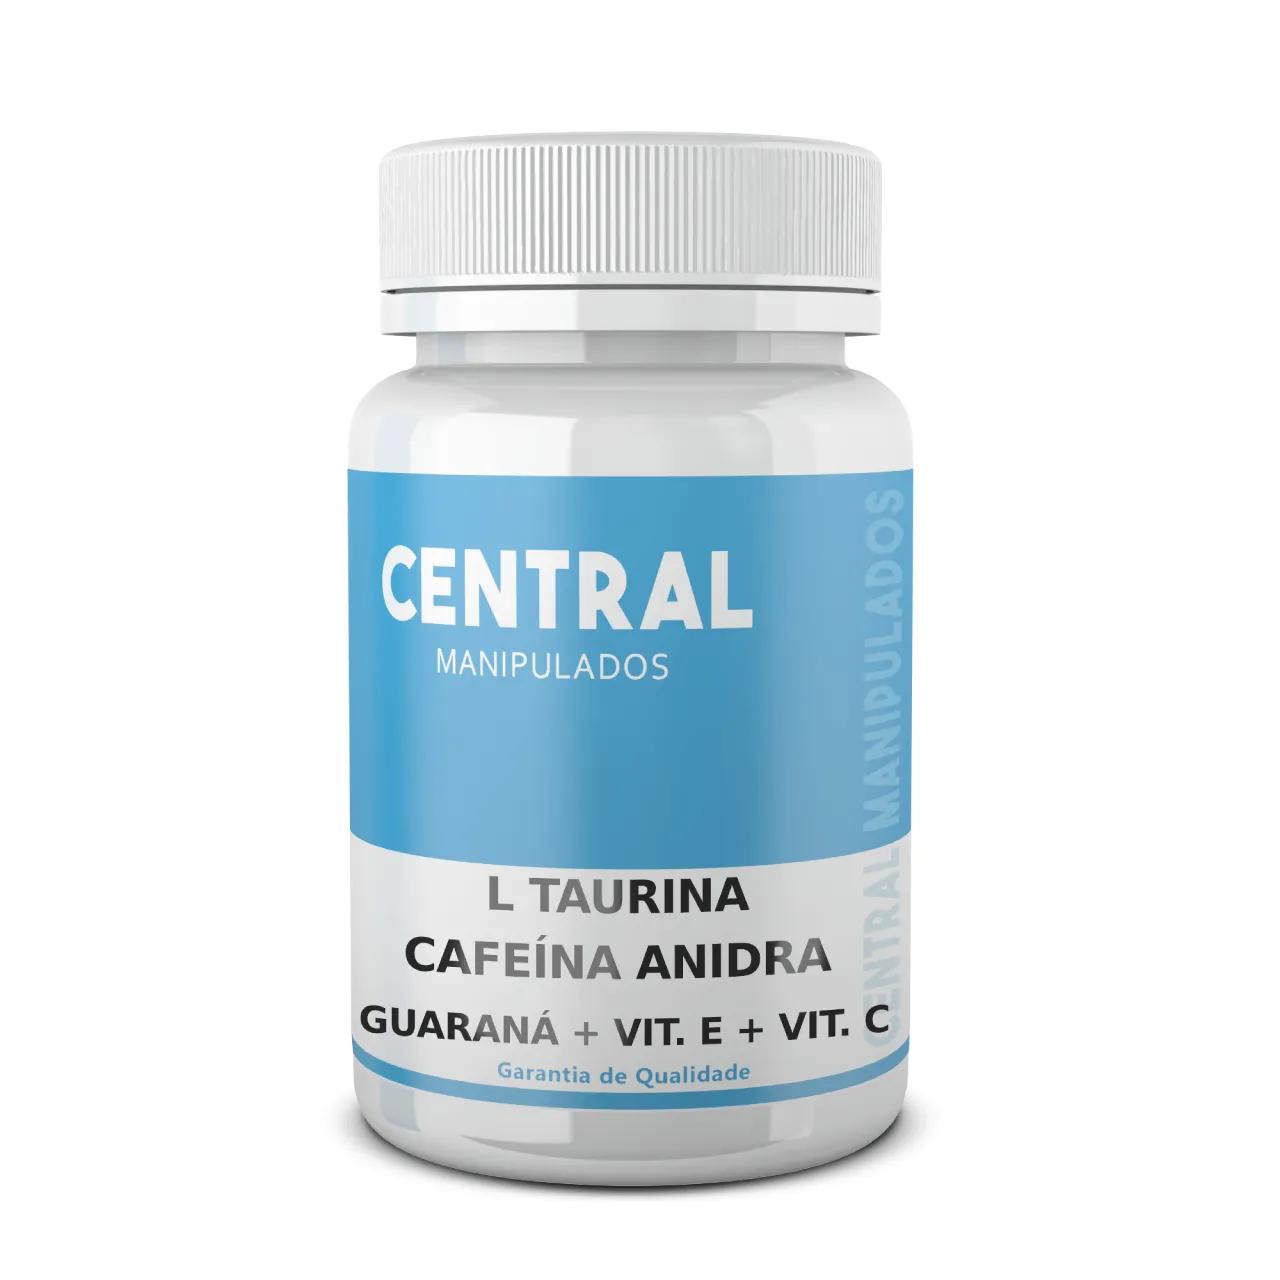 L Taurina 150mg  + Cafeína Anidra 60mg + Guaraná 100mg + Vit E 30mg + Vit C 50mg - Energia e Disposição - 30 cápsulas